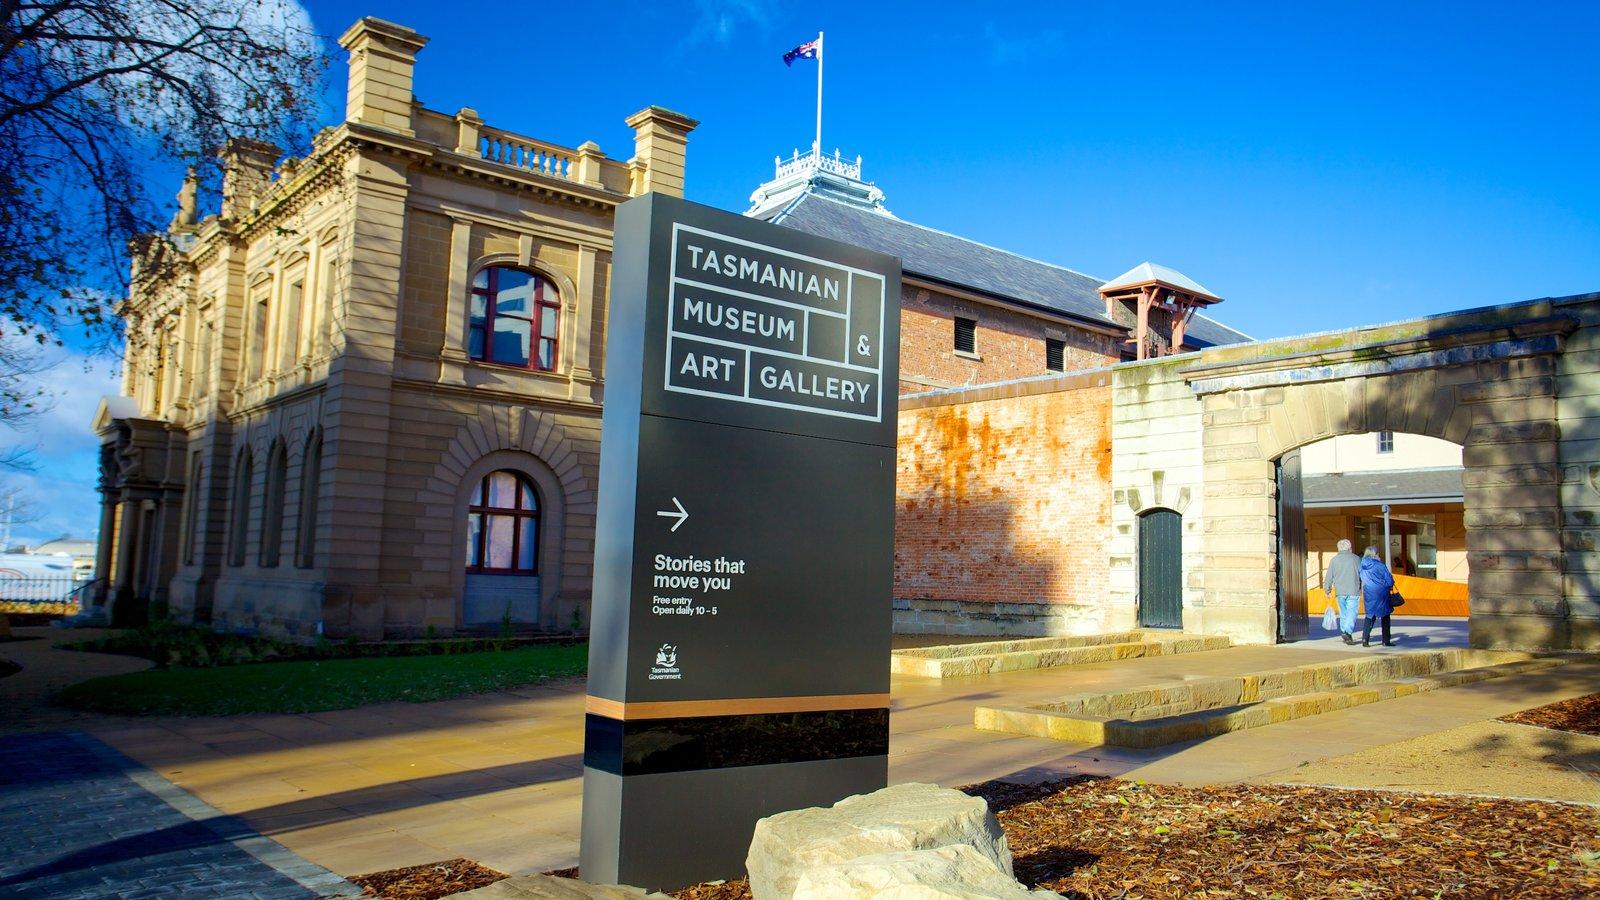 Tasmanian Museum and Art Gallery